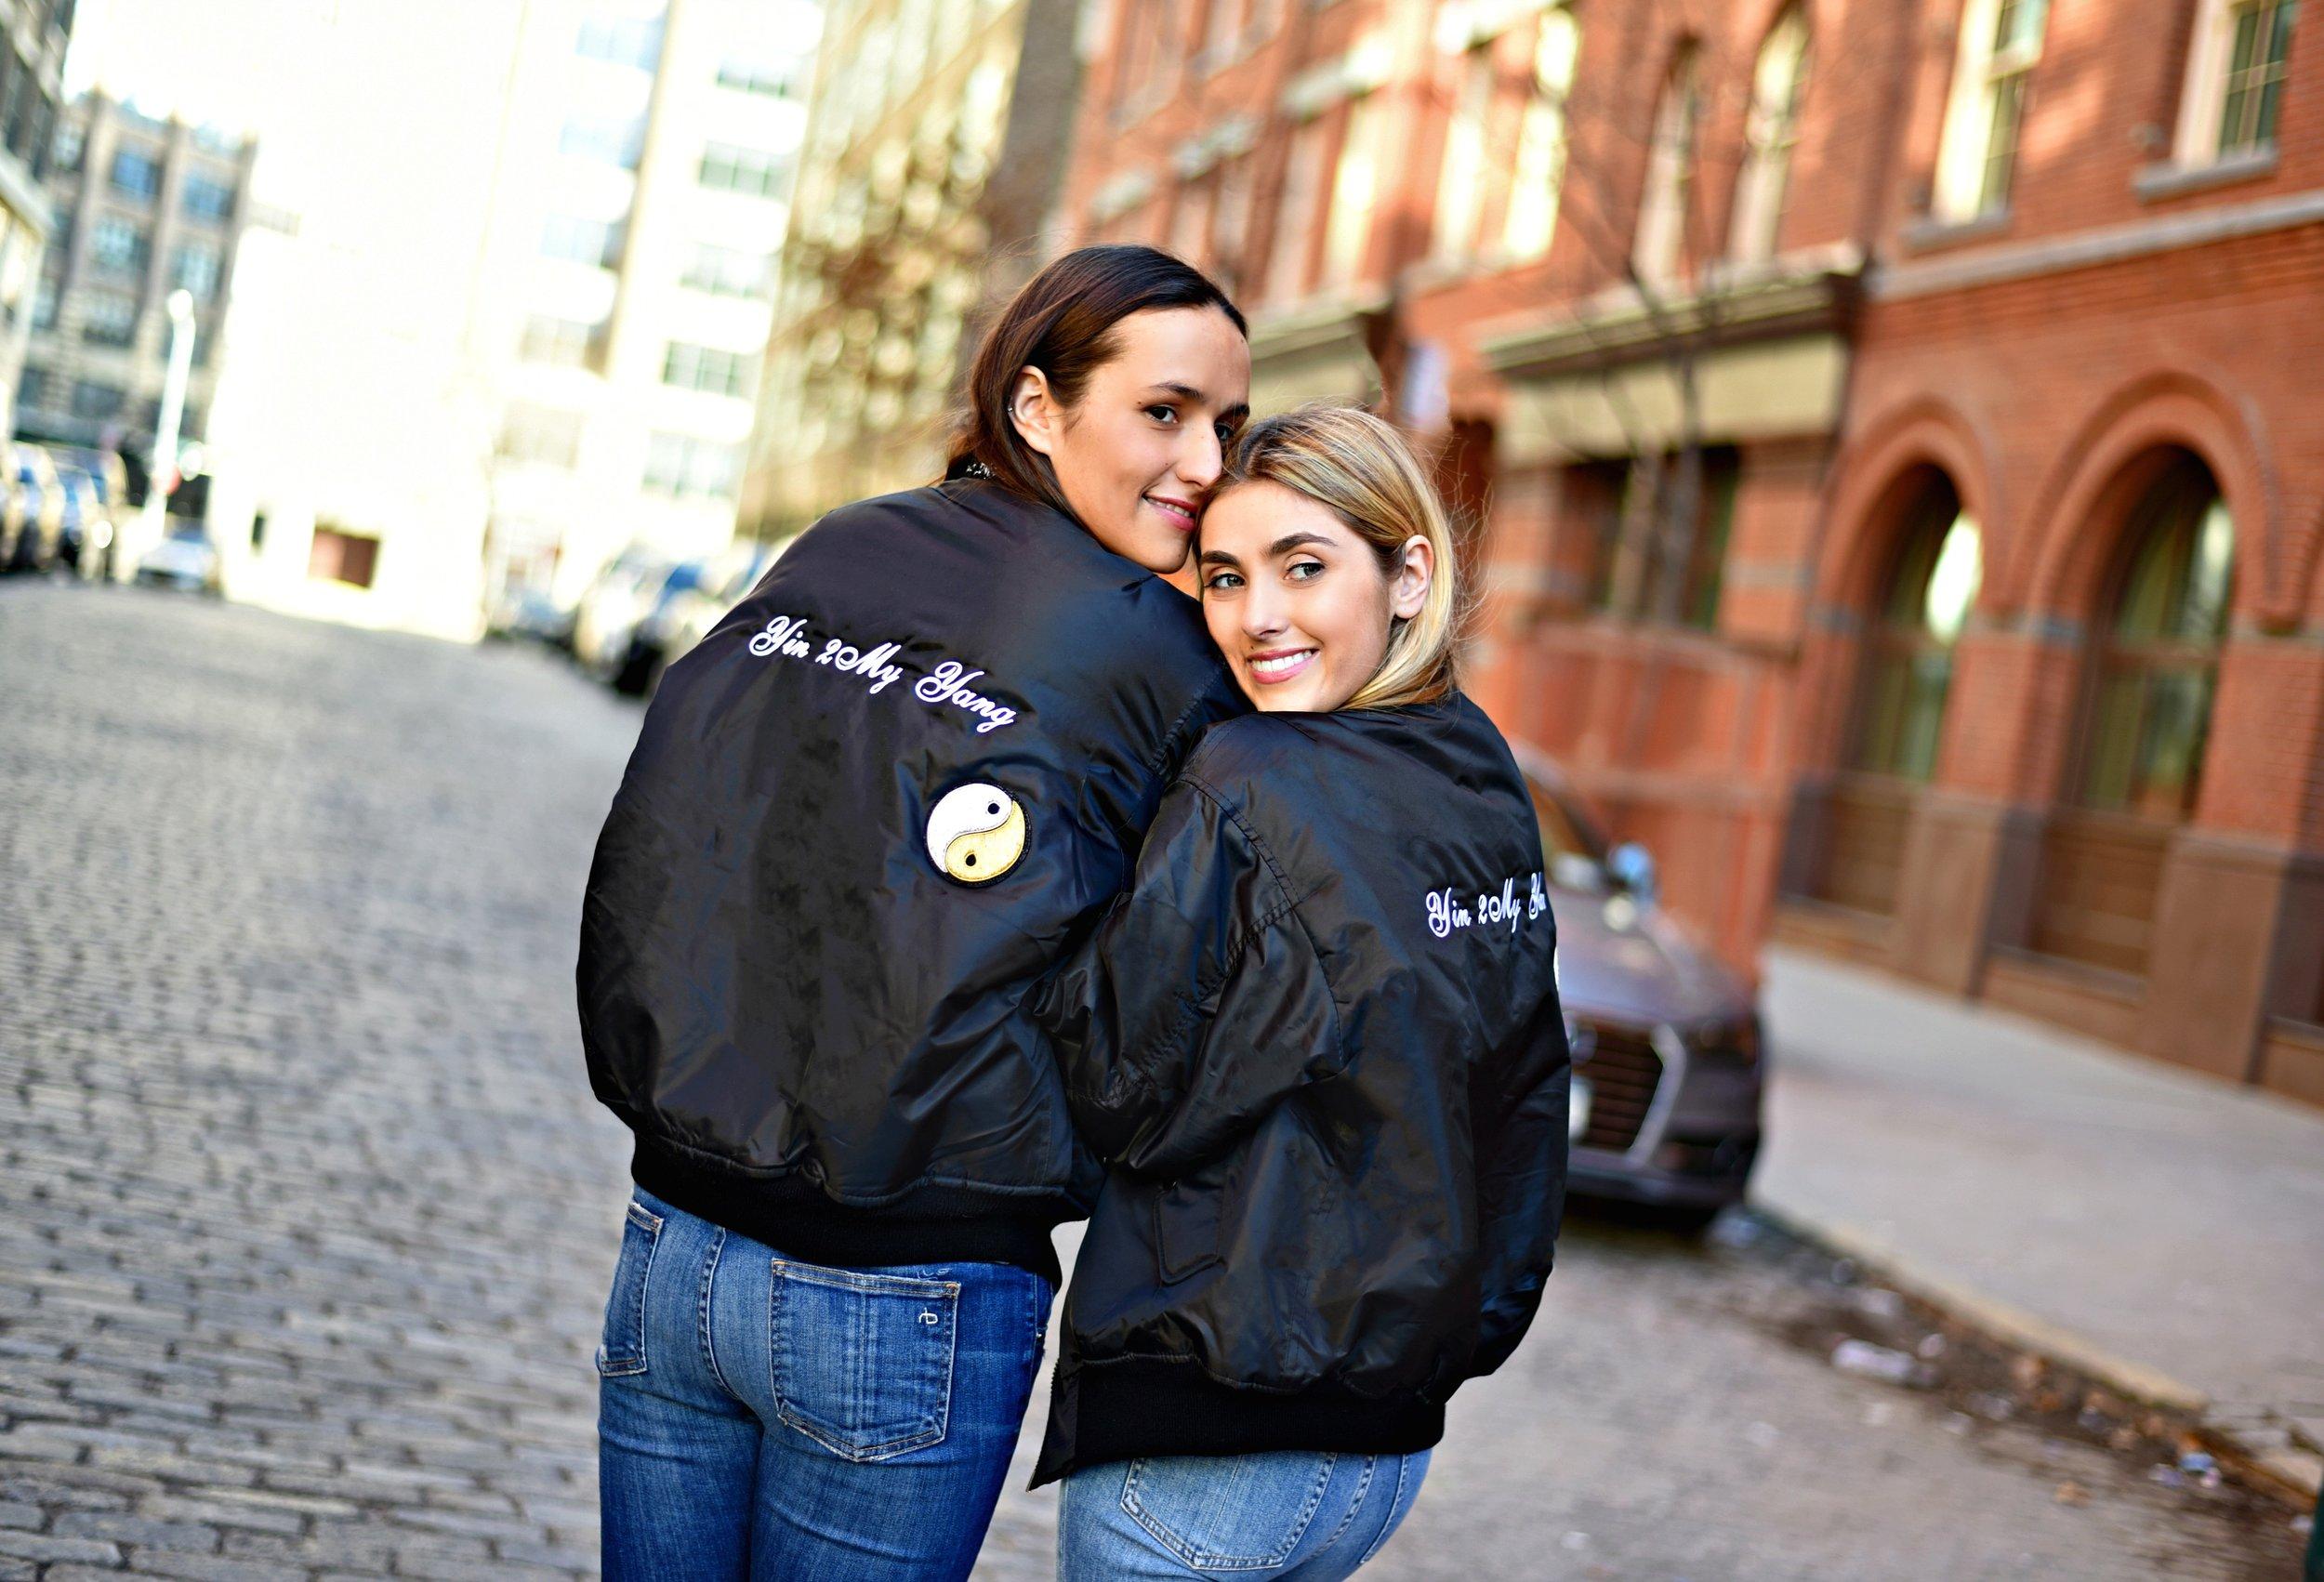 SOPHIE & CHARLOTTE BICKLEY YIN 2MY YANG SISTER FASHION BLOGGERS NYC UNEMPLOYED DENIM POST 15.jpg